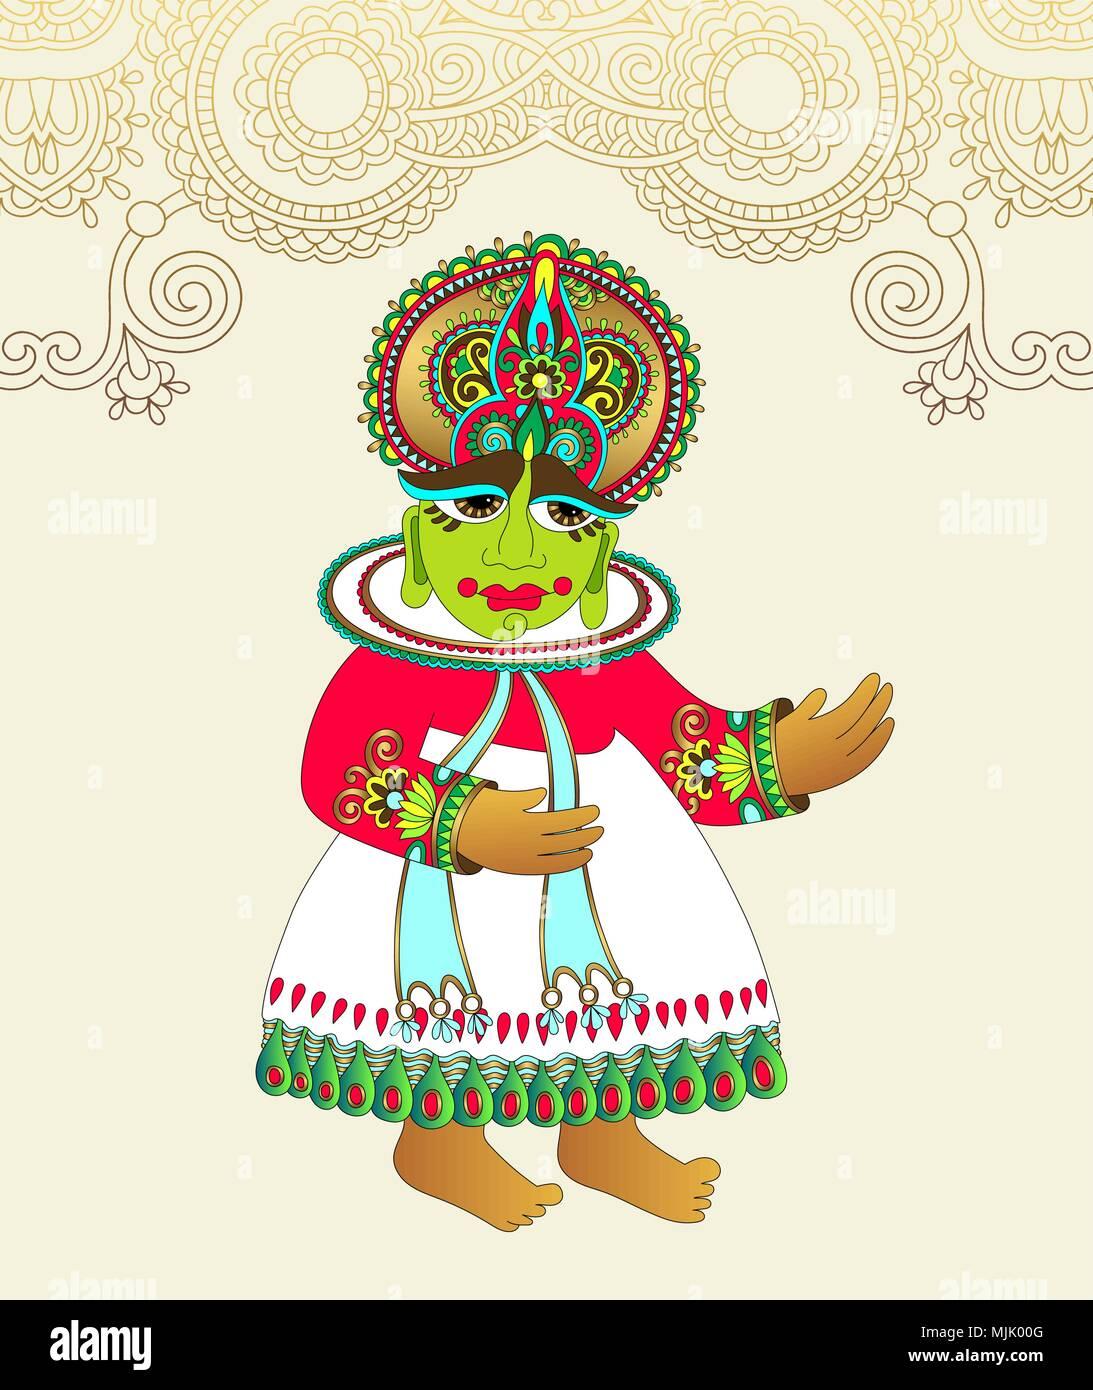 Original Drawing Of Traditional Indian Kathakali Dancer Stock Vector Image Art Alamy